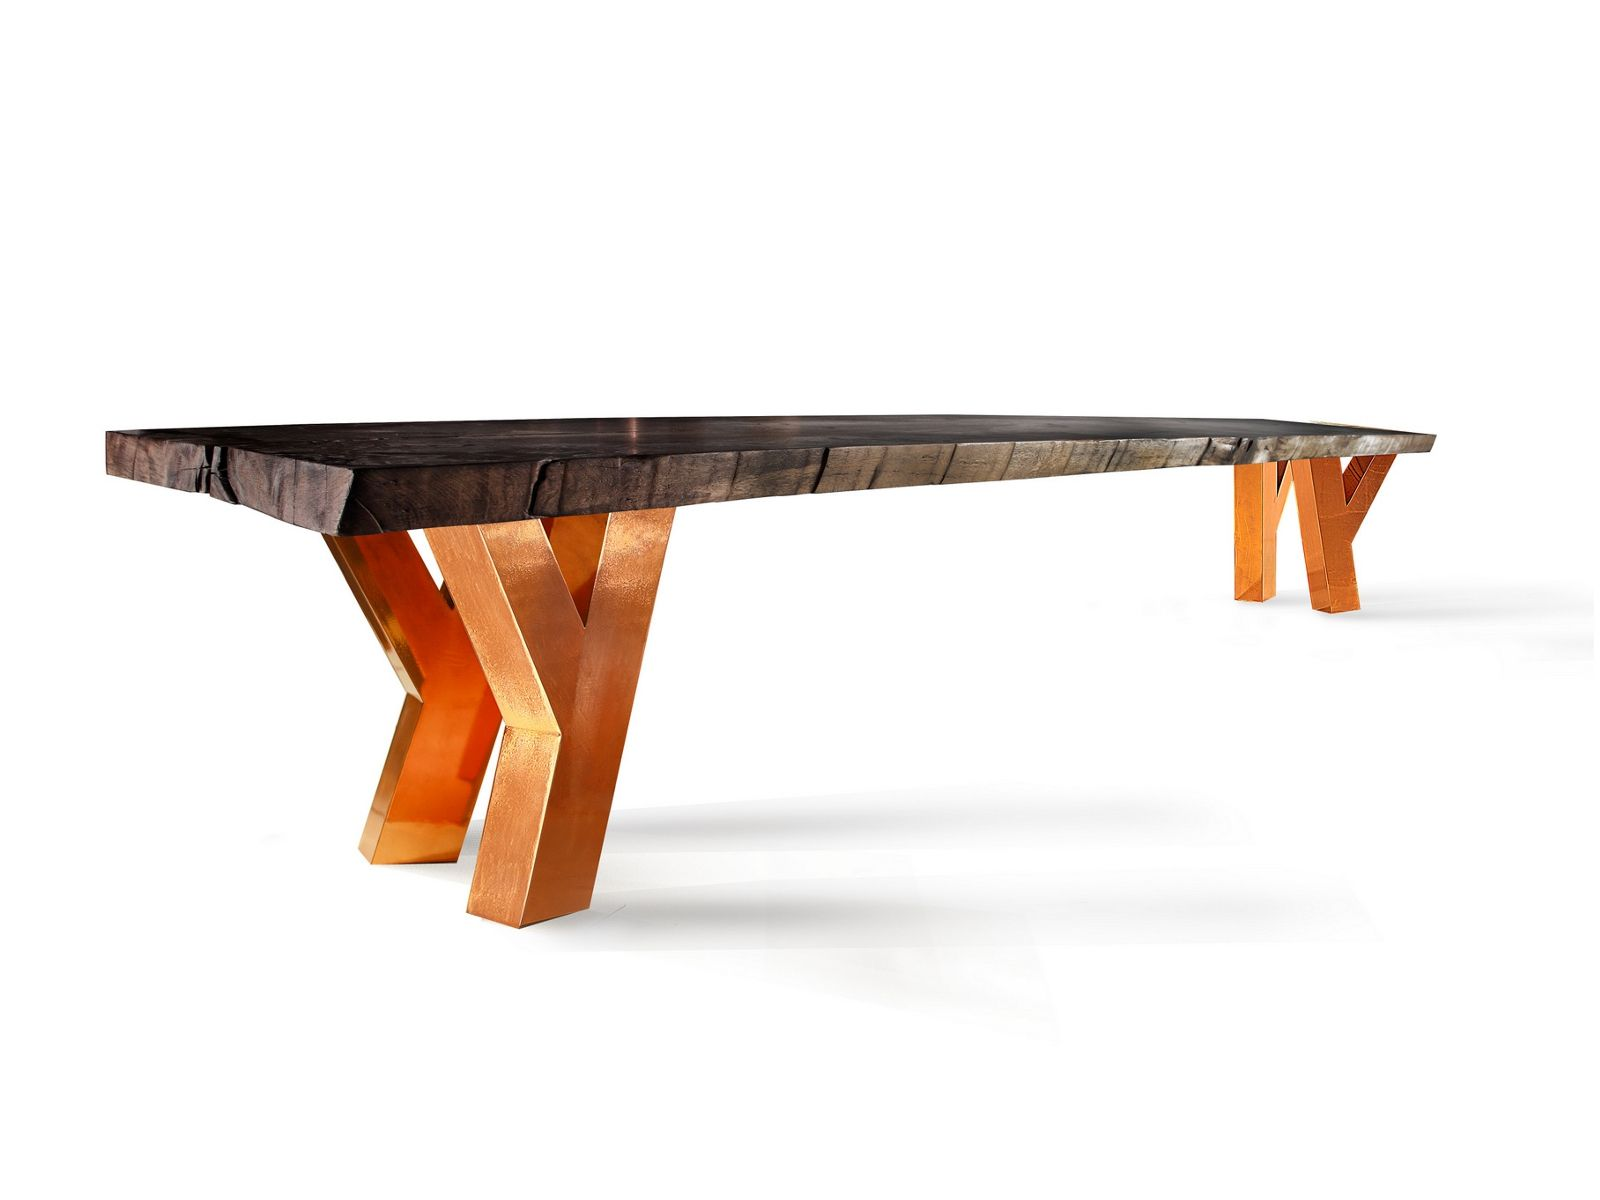 High Quality Rectangular Custom Solid Wood Dining Table MY BELLA MAISA   COPPER LEG MY  BELLAu2026